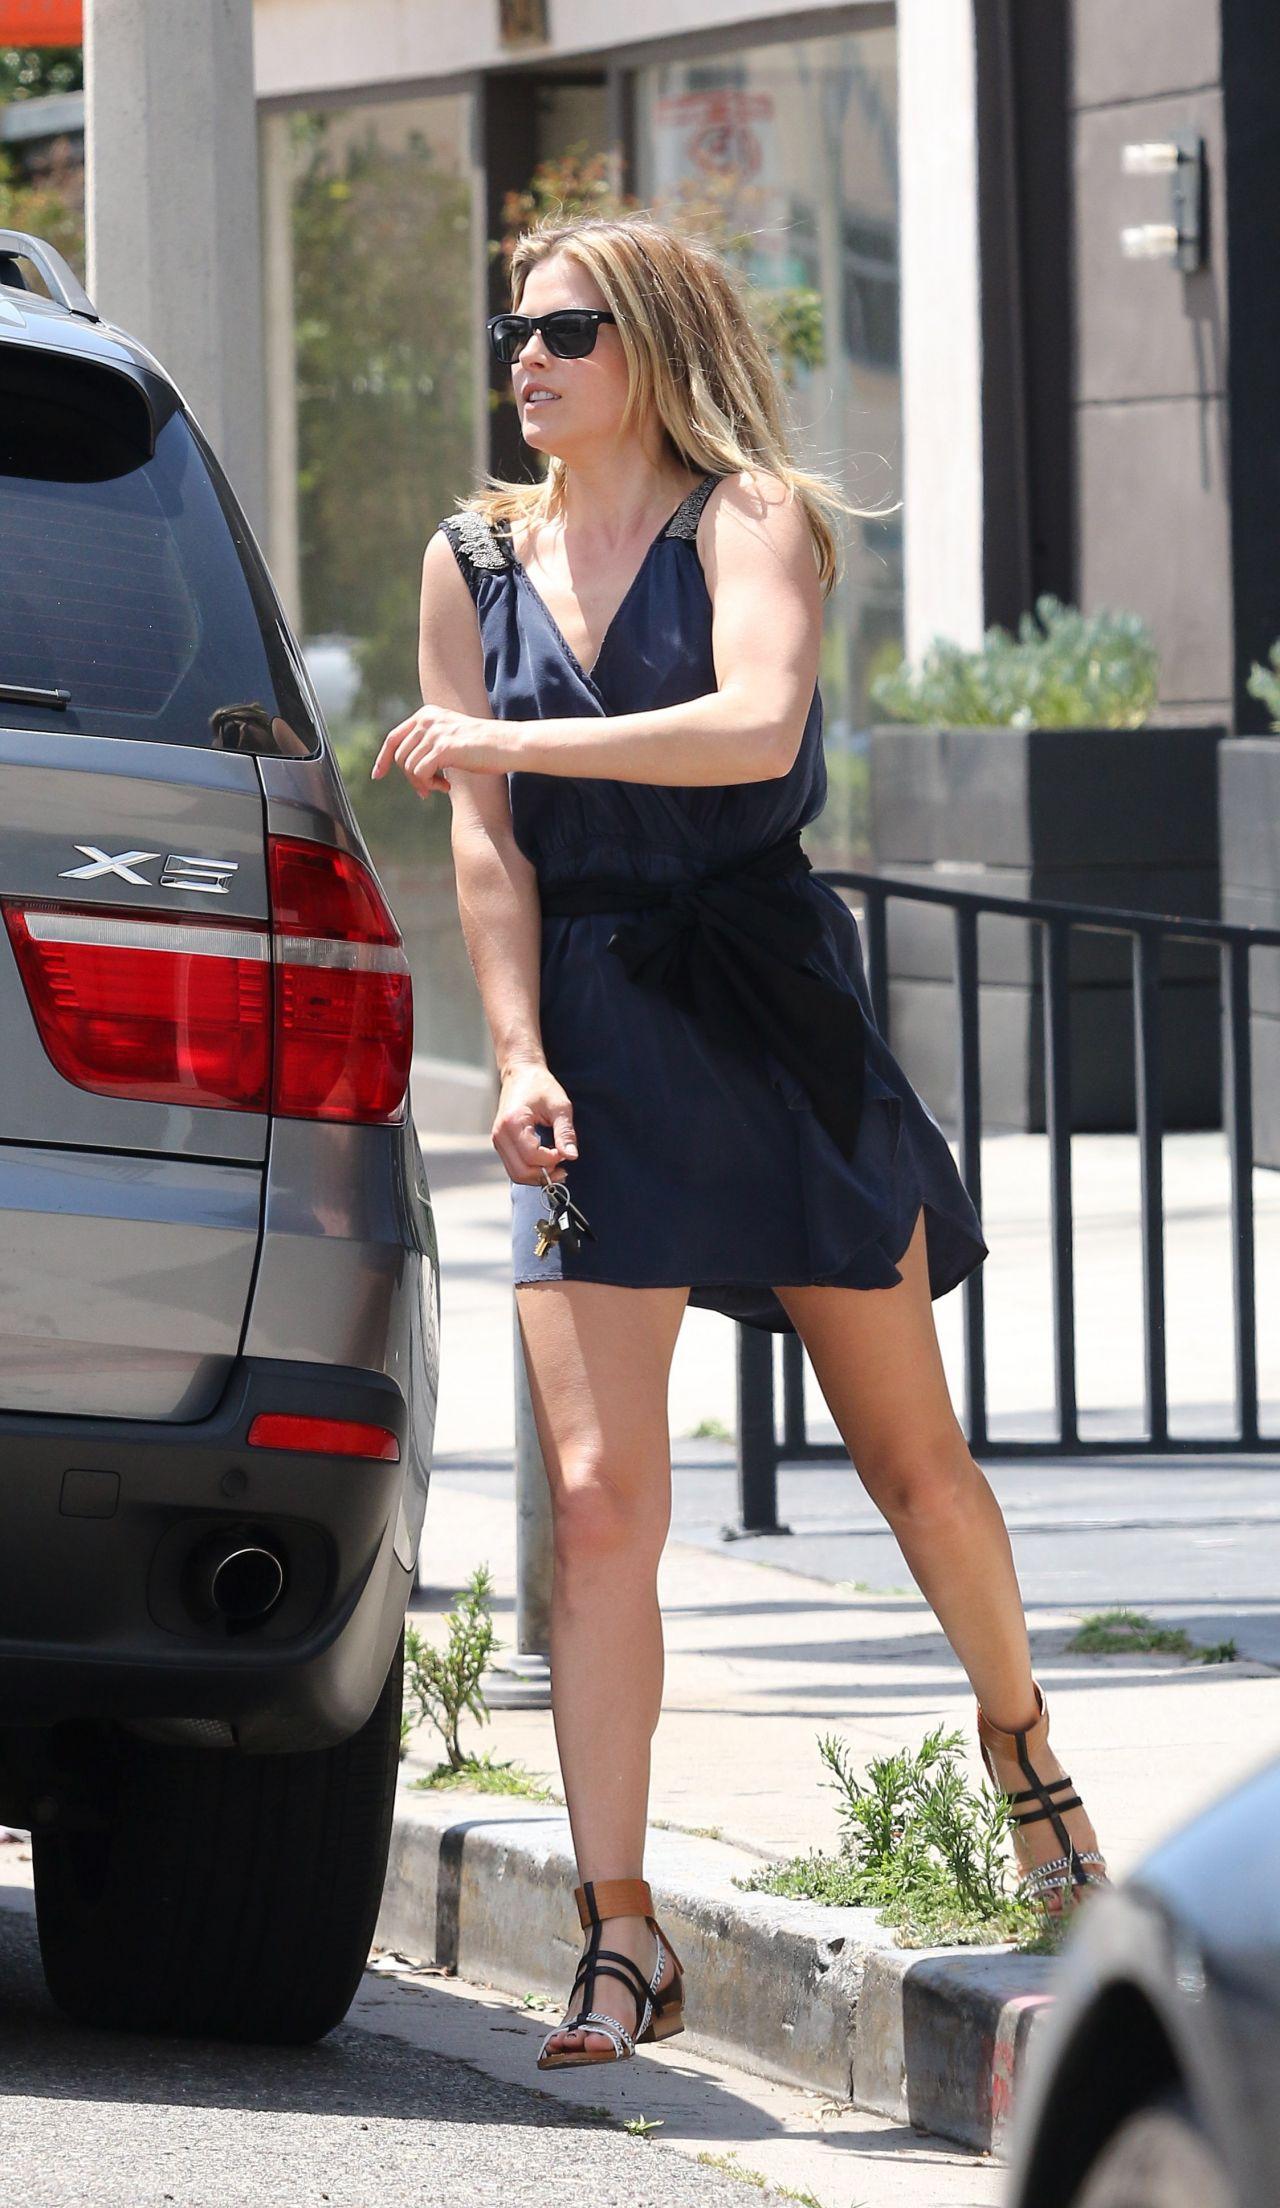 Ali Larter Shows Legs In Mini Dress Out In Los Angeles